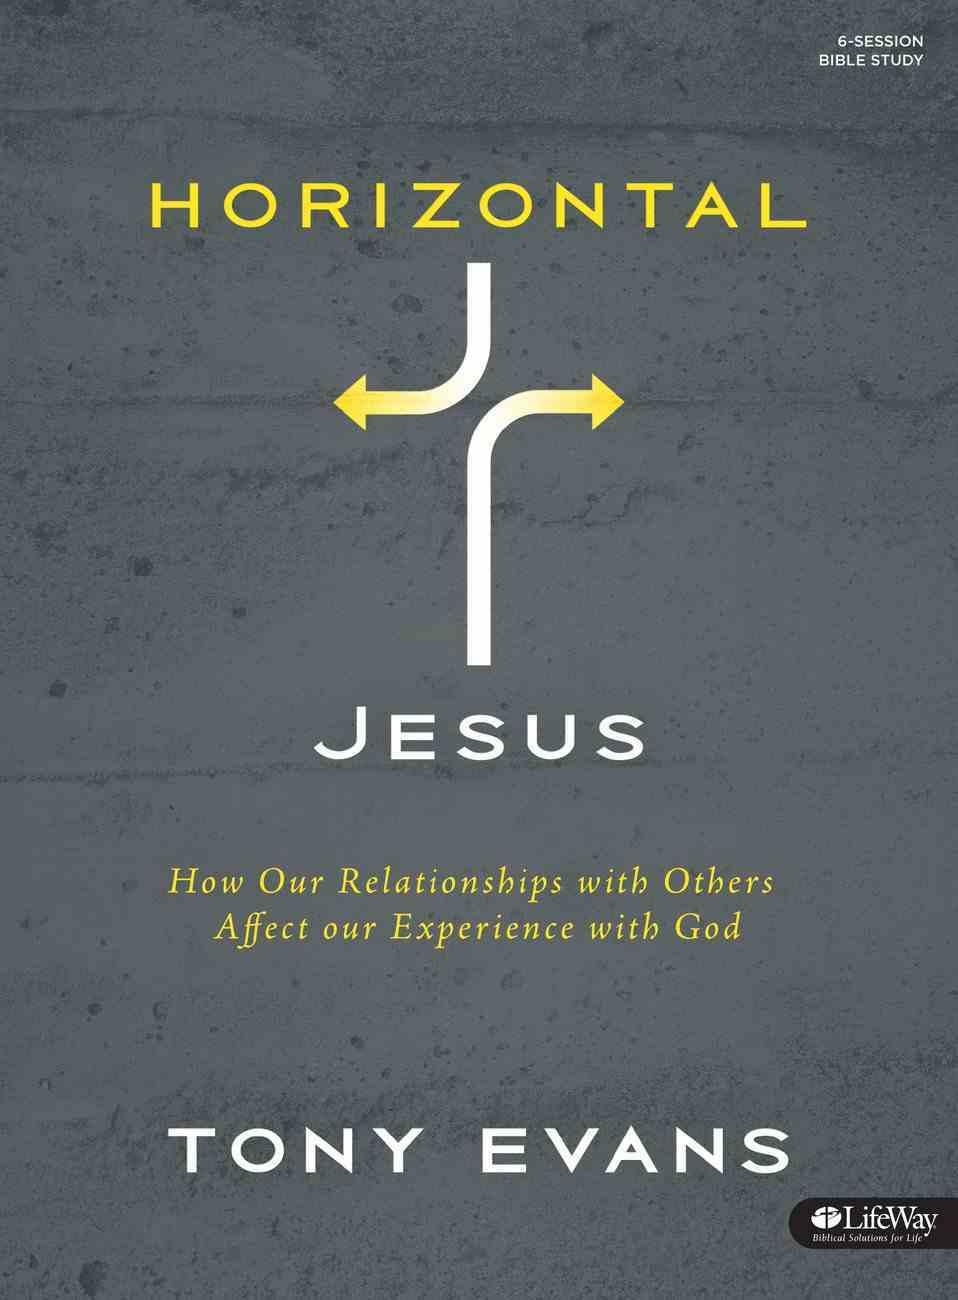 Horizontal Jesus (Bible Study Book) Paperback